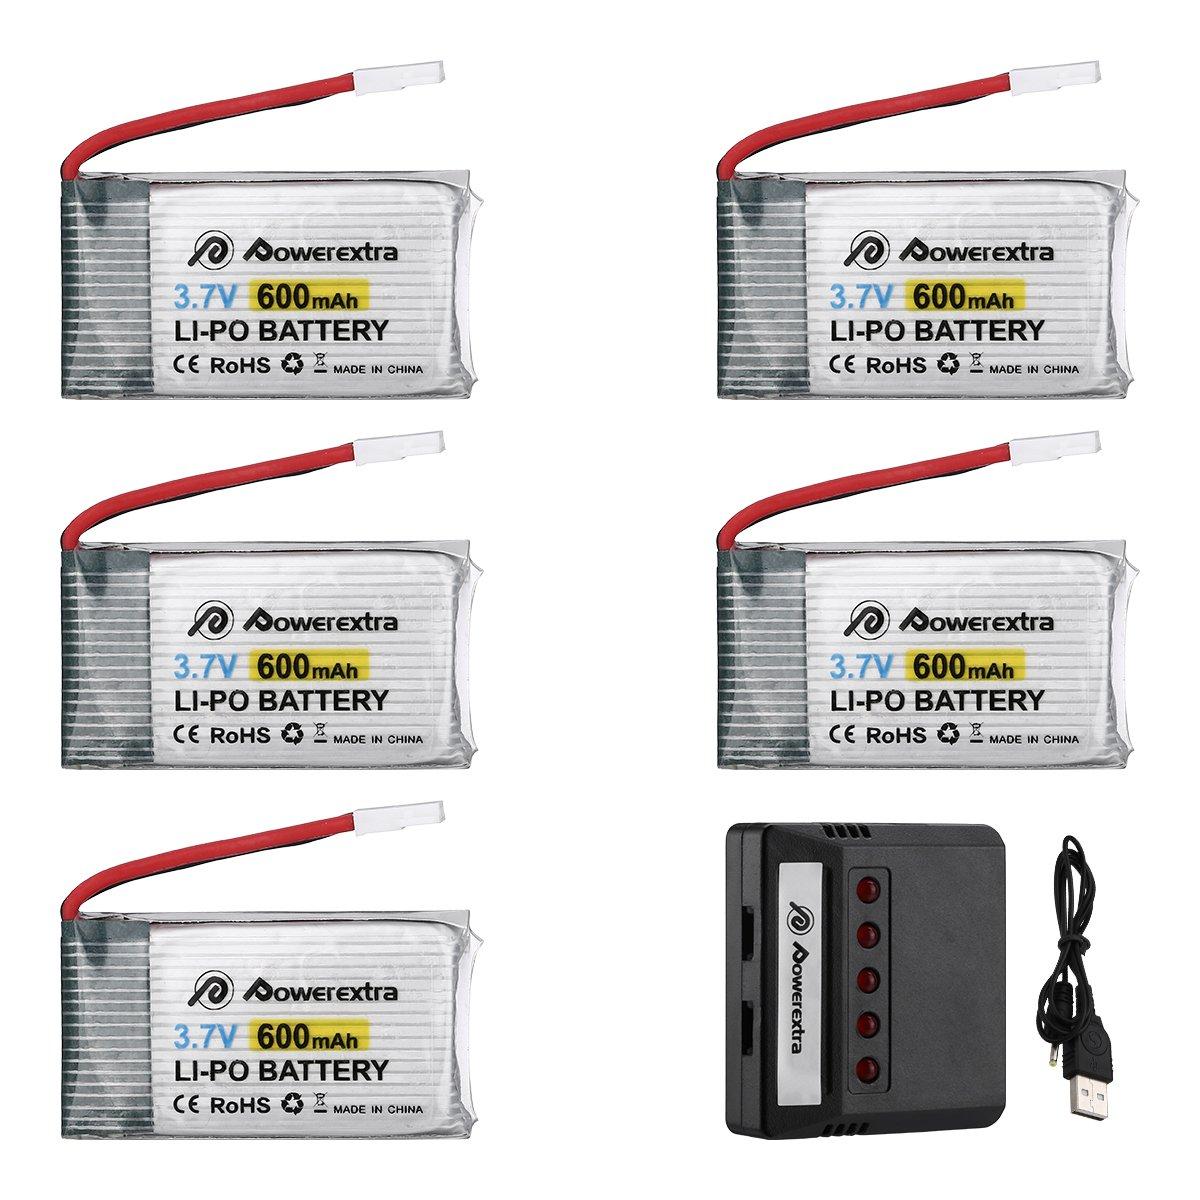 Powerextra 5Pcs 3.7V 600mAh LiPO Battery & X5 Battery Charger Compatible with Syma X5 X5C X5SW X5SC-1 CX-3W CX-31 M68 M68R UDI U45 Beginners X708W Wi-Fi FPV Training RC Quadcopter